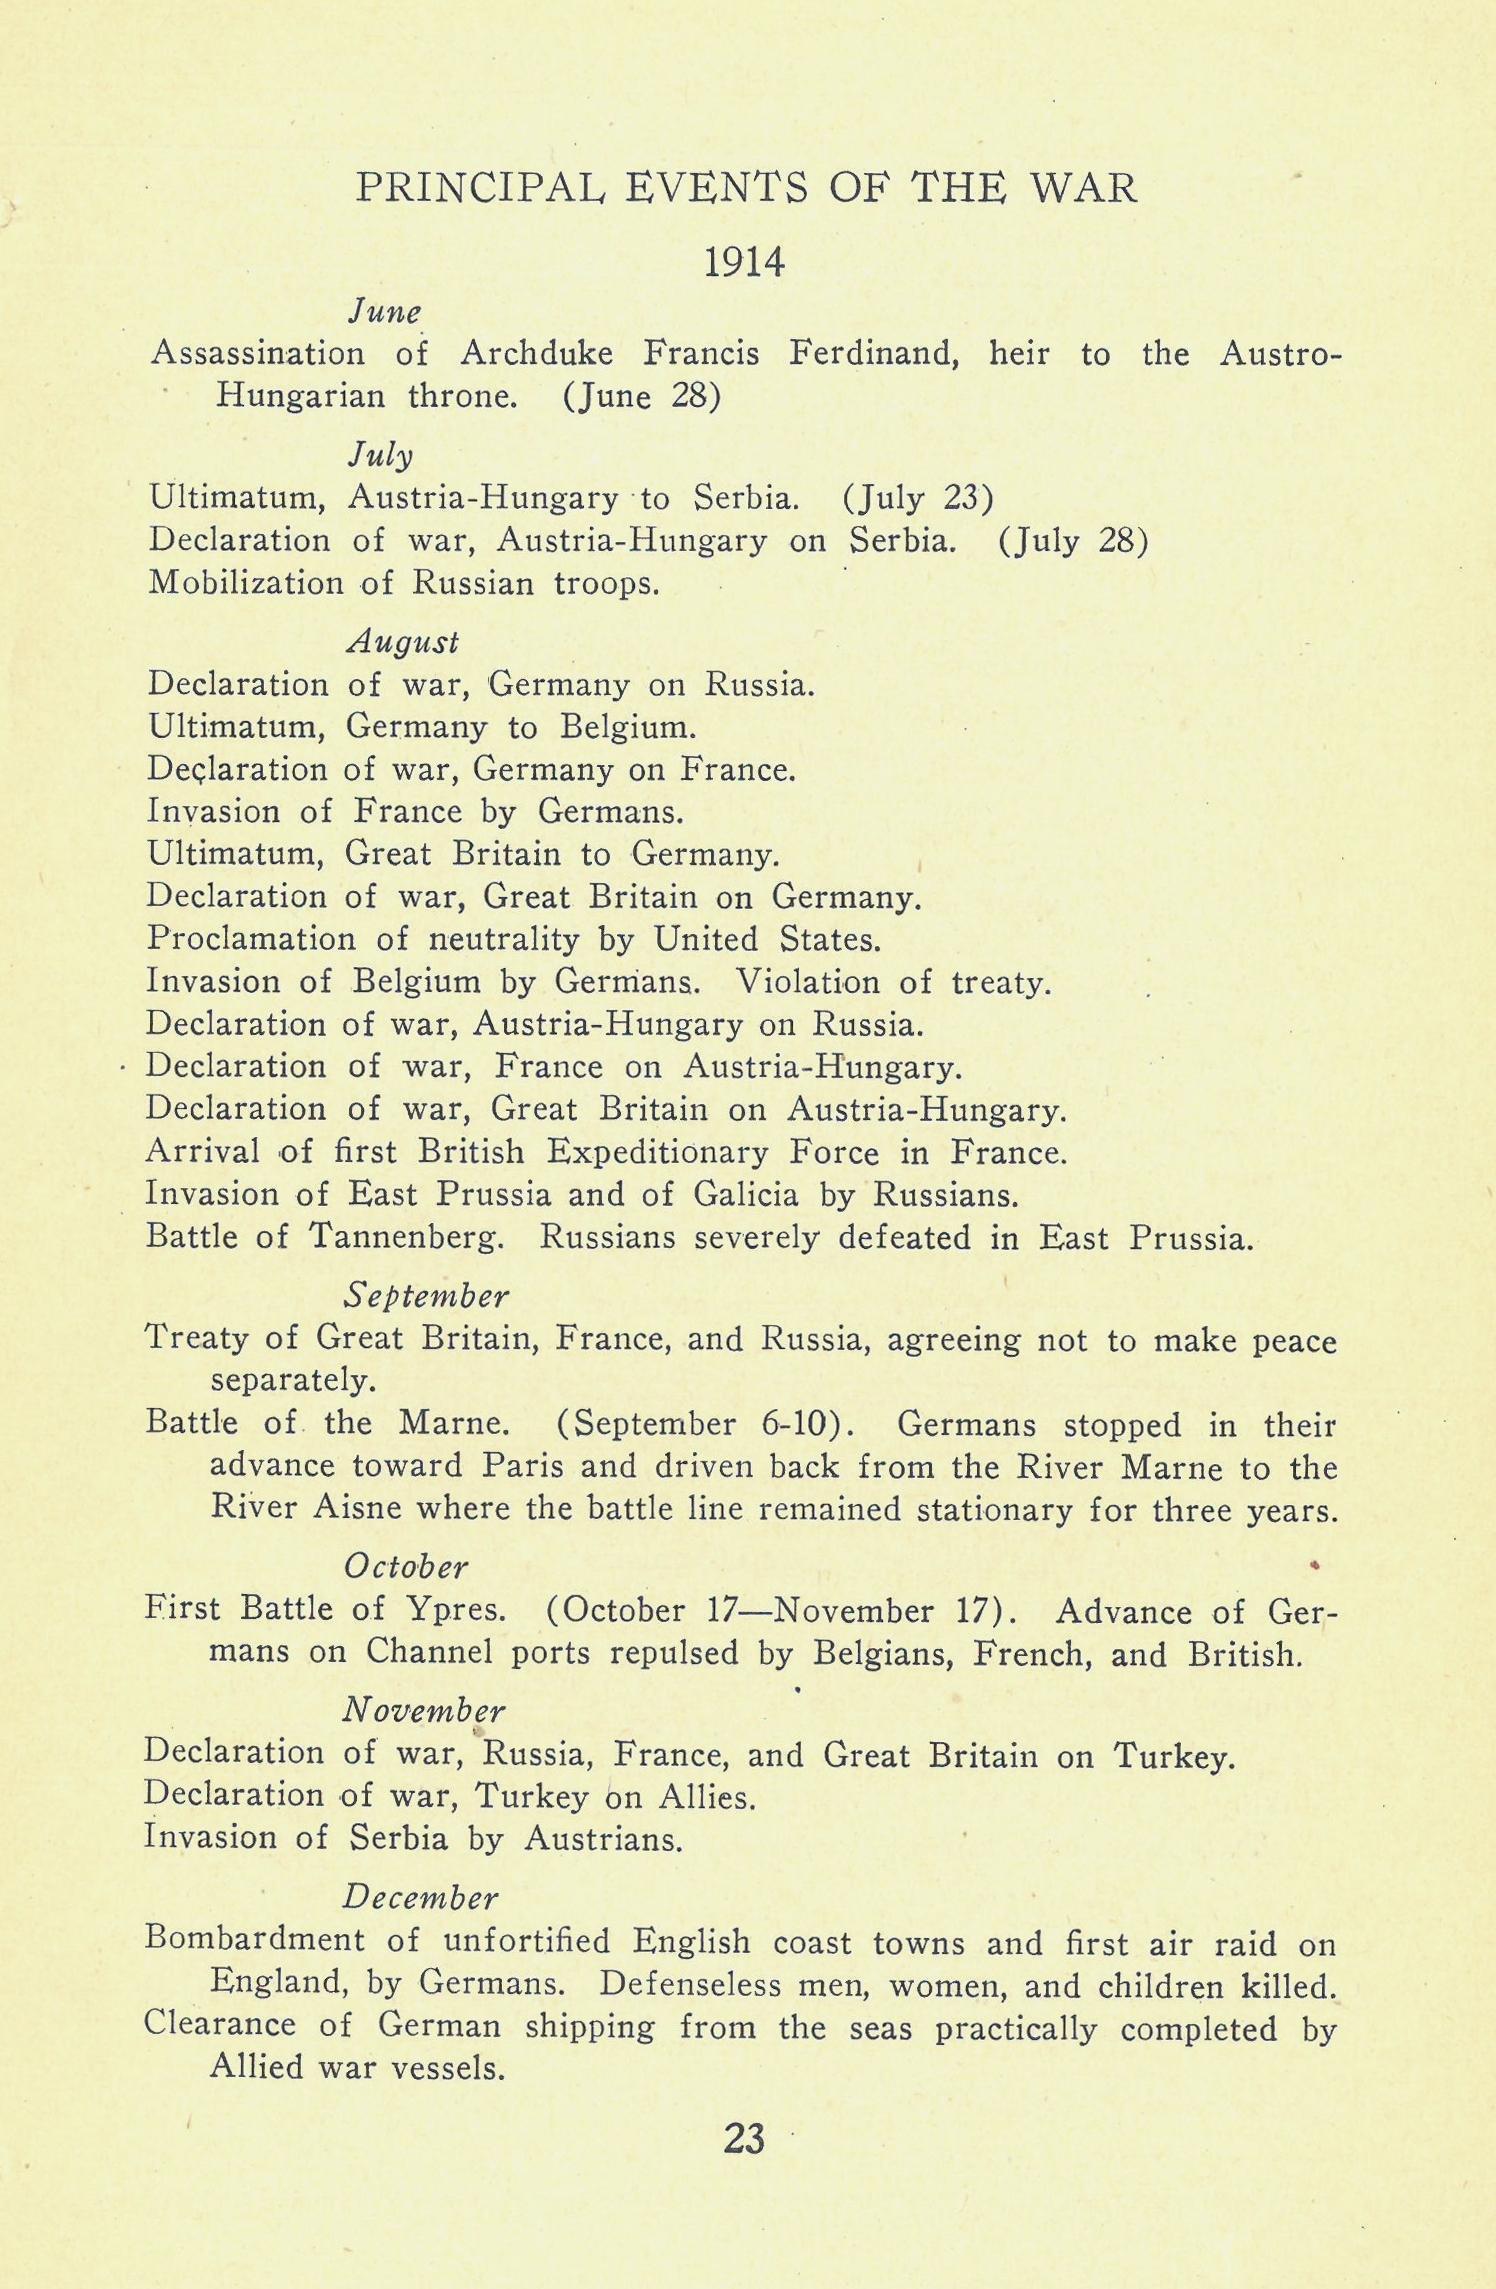 World War I history syllabus, June 1918. NYC Municipal Library.